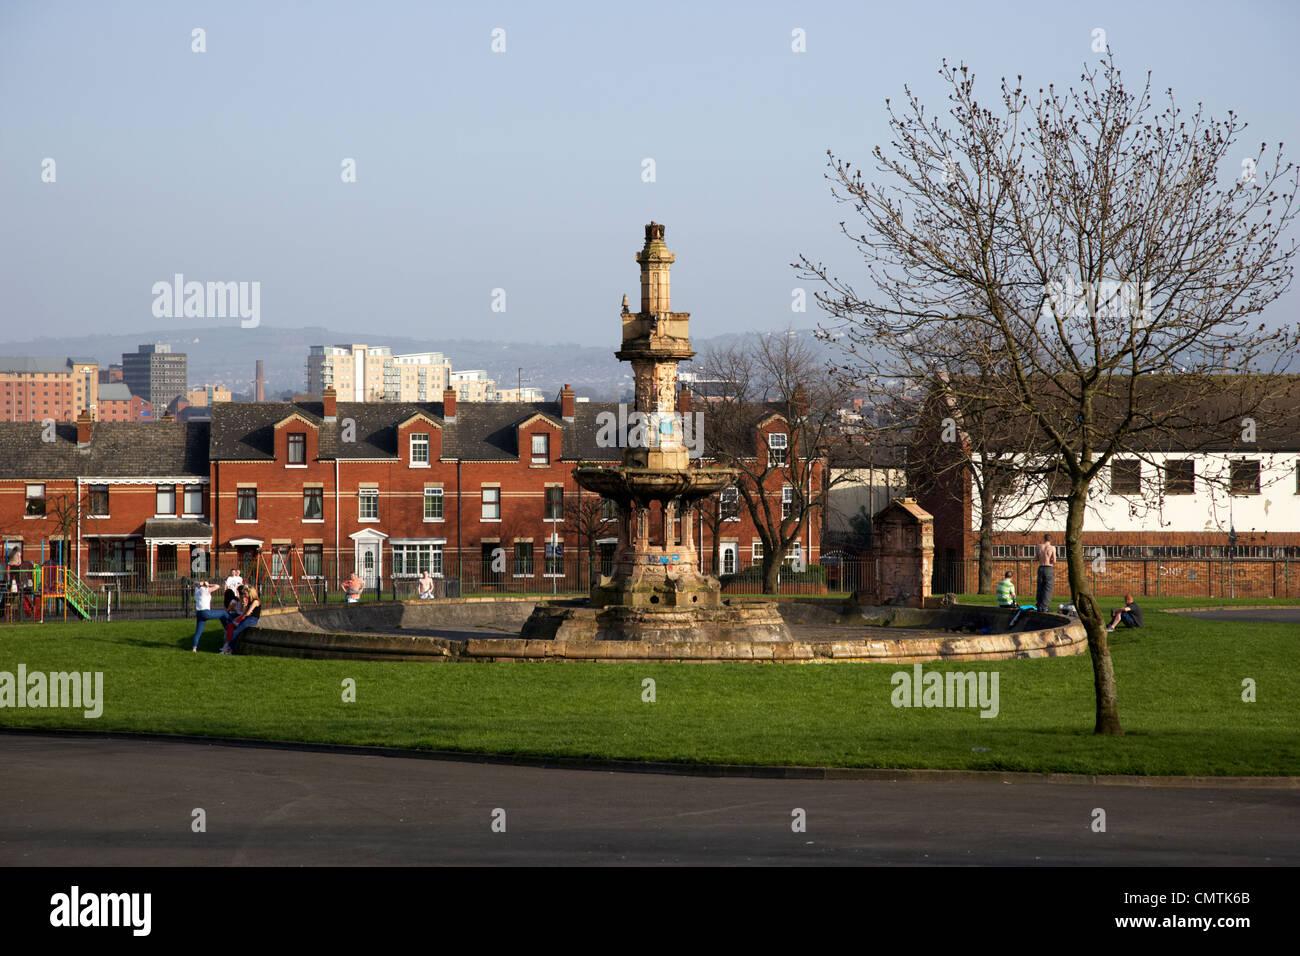 victorian fountain in dunville park lower falls road area gaeltacht quarter belfast northern ireland uk - Stock Image